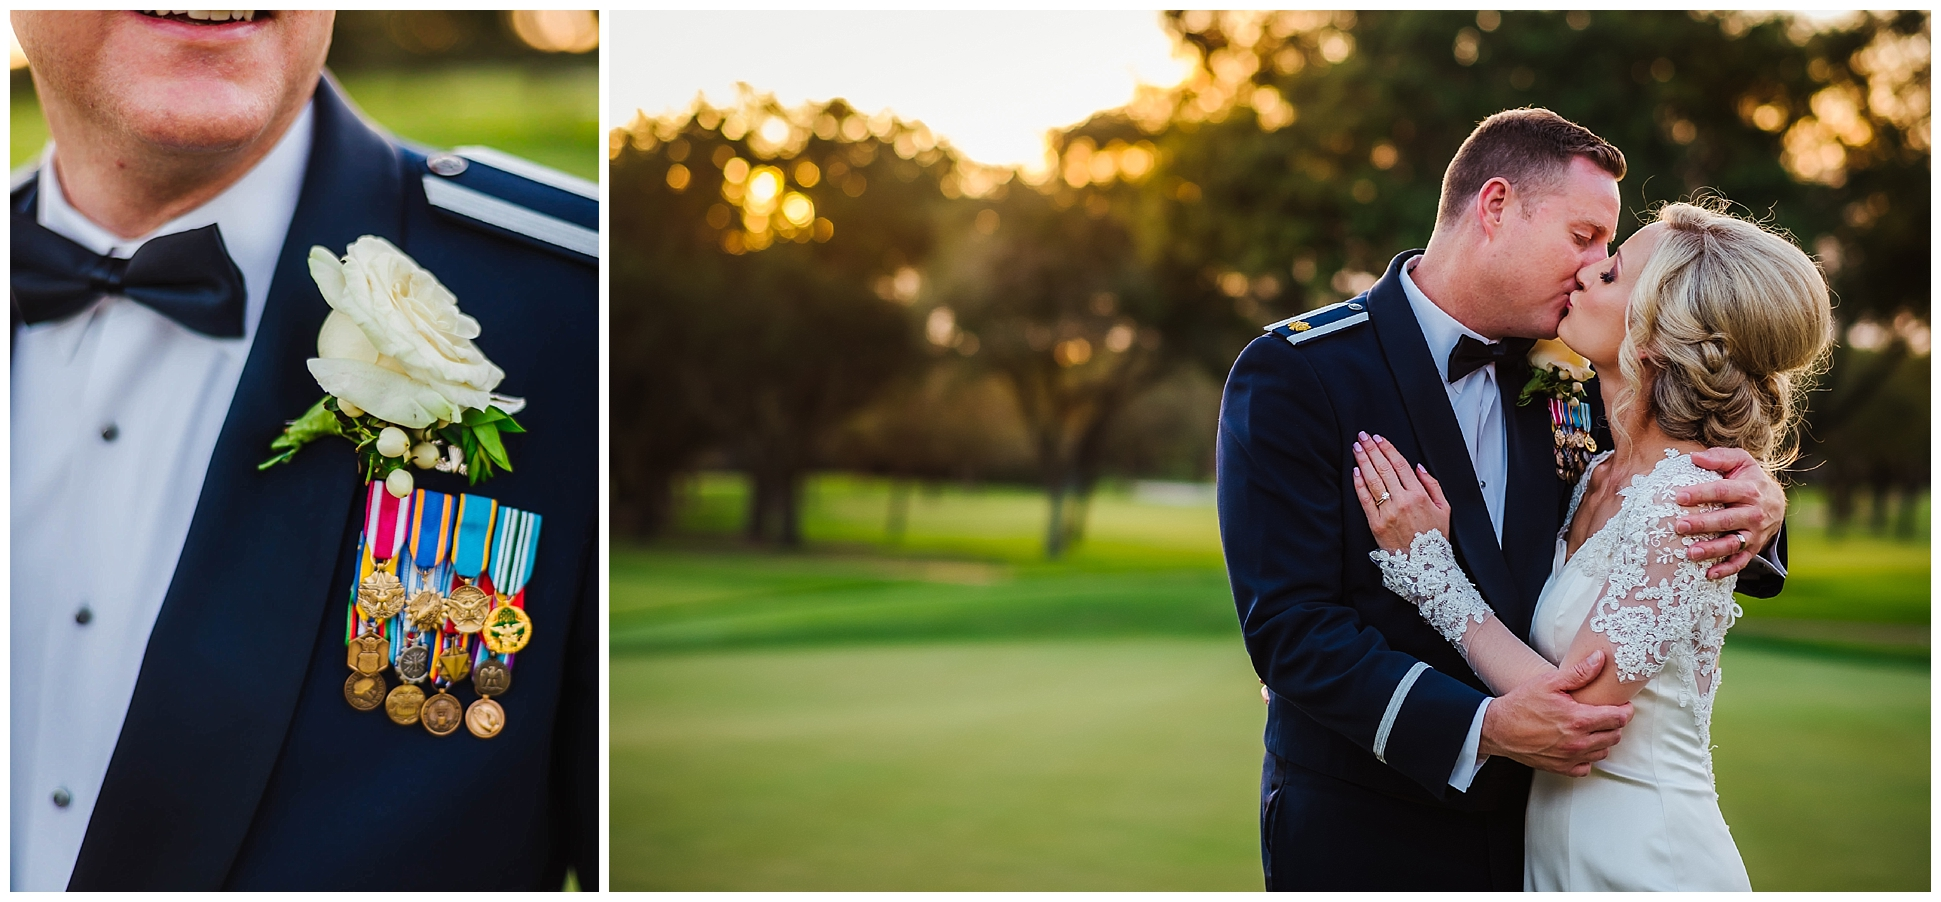 tampa-wedding-photographer-sleeves-palma-ceia-country-club-golf-course-sunset-luxury_0094.jpg